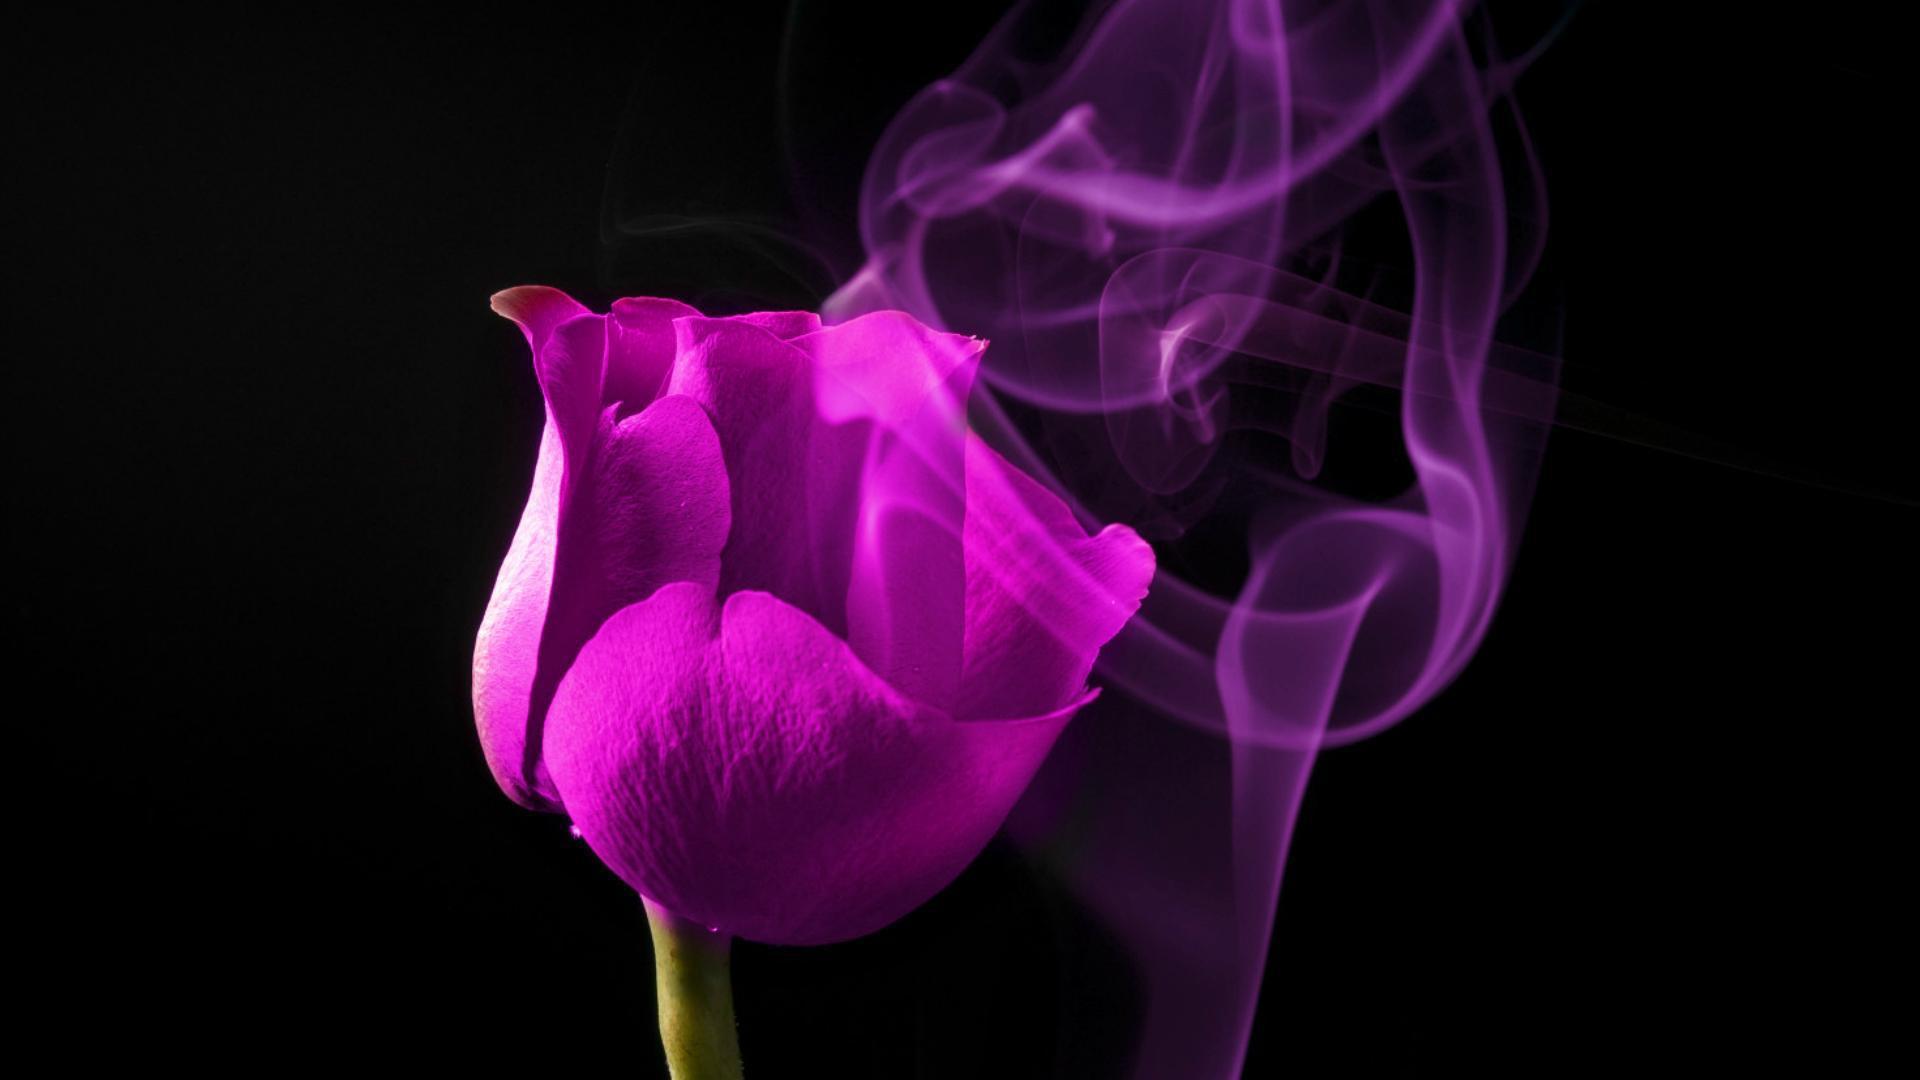 Purple Rose Wallpapers Hd